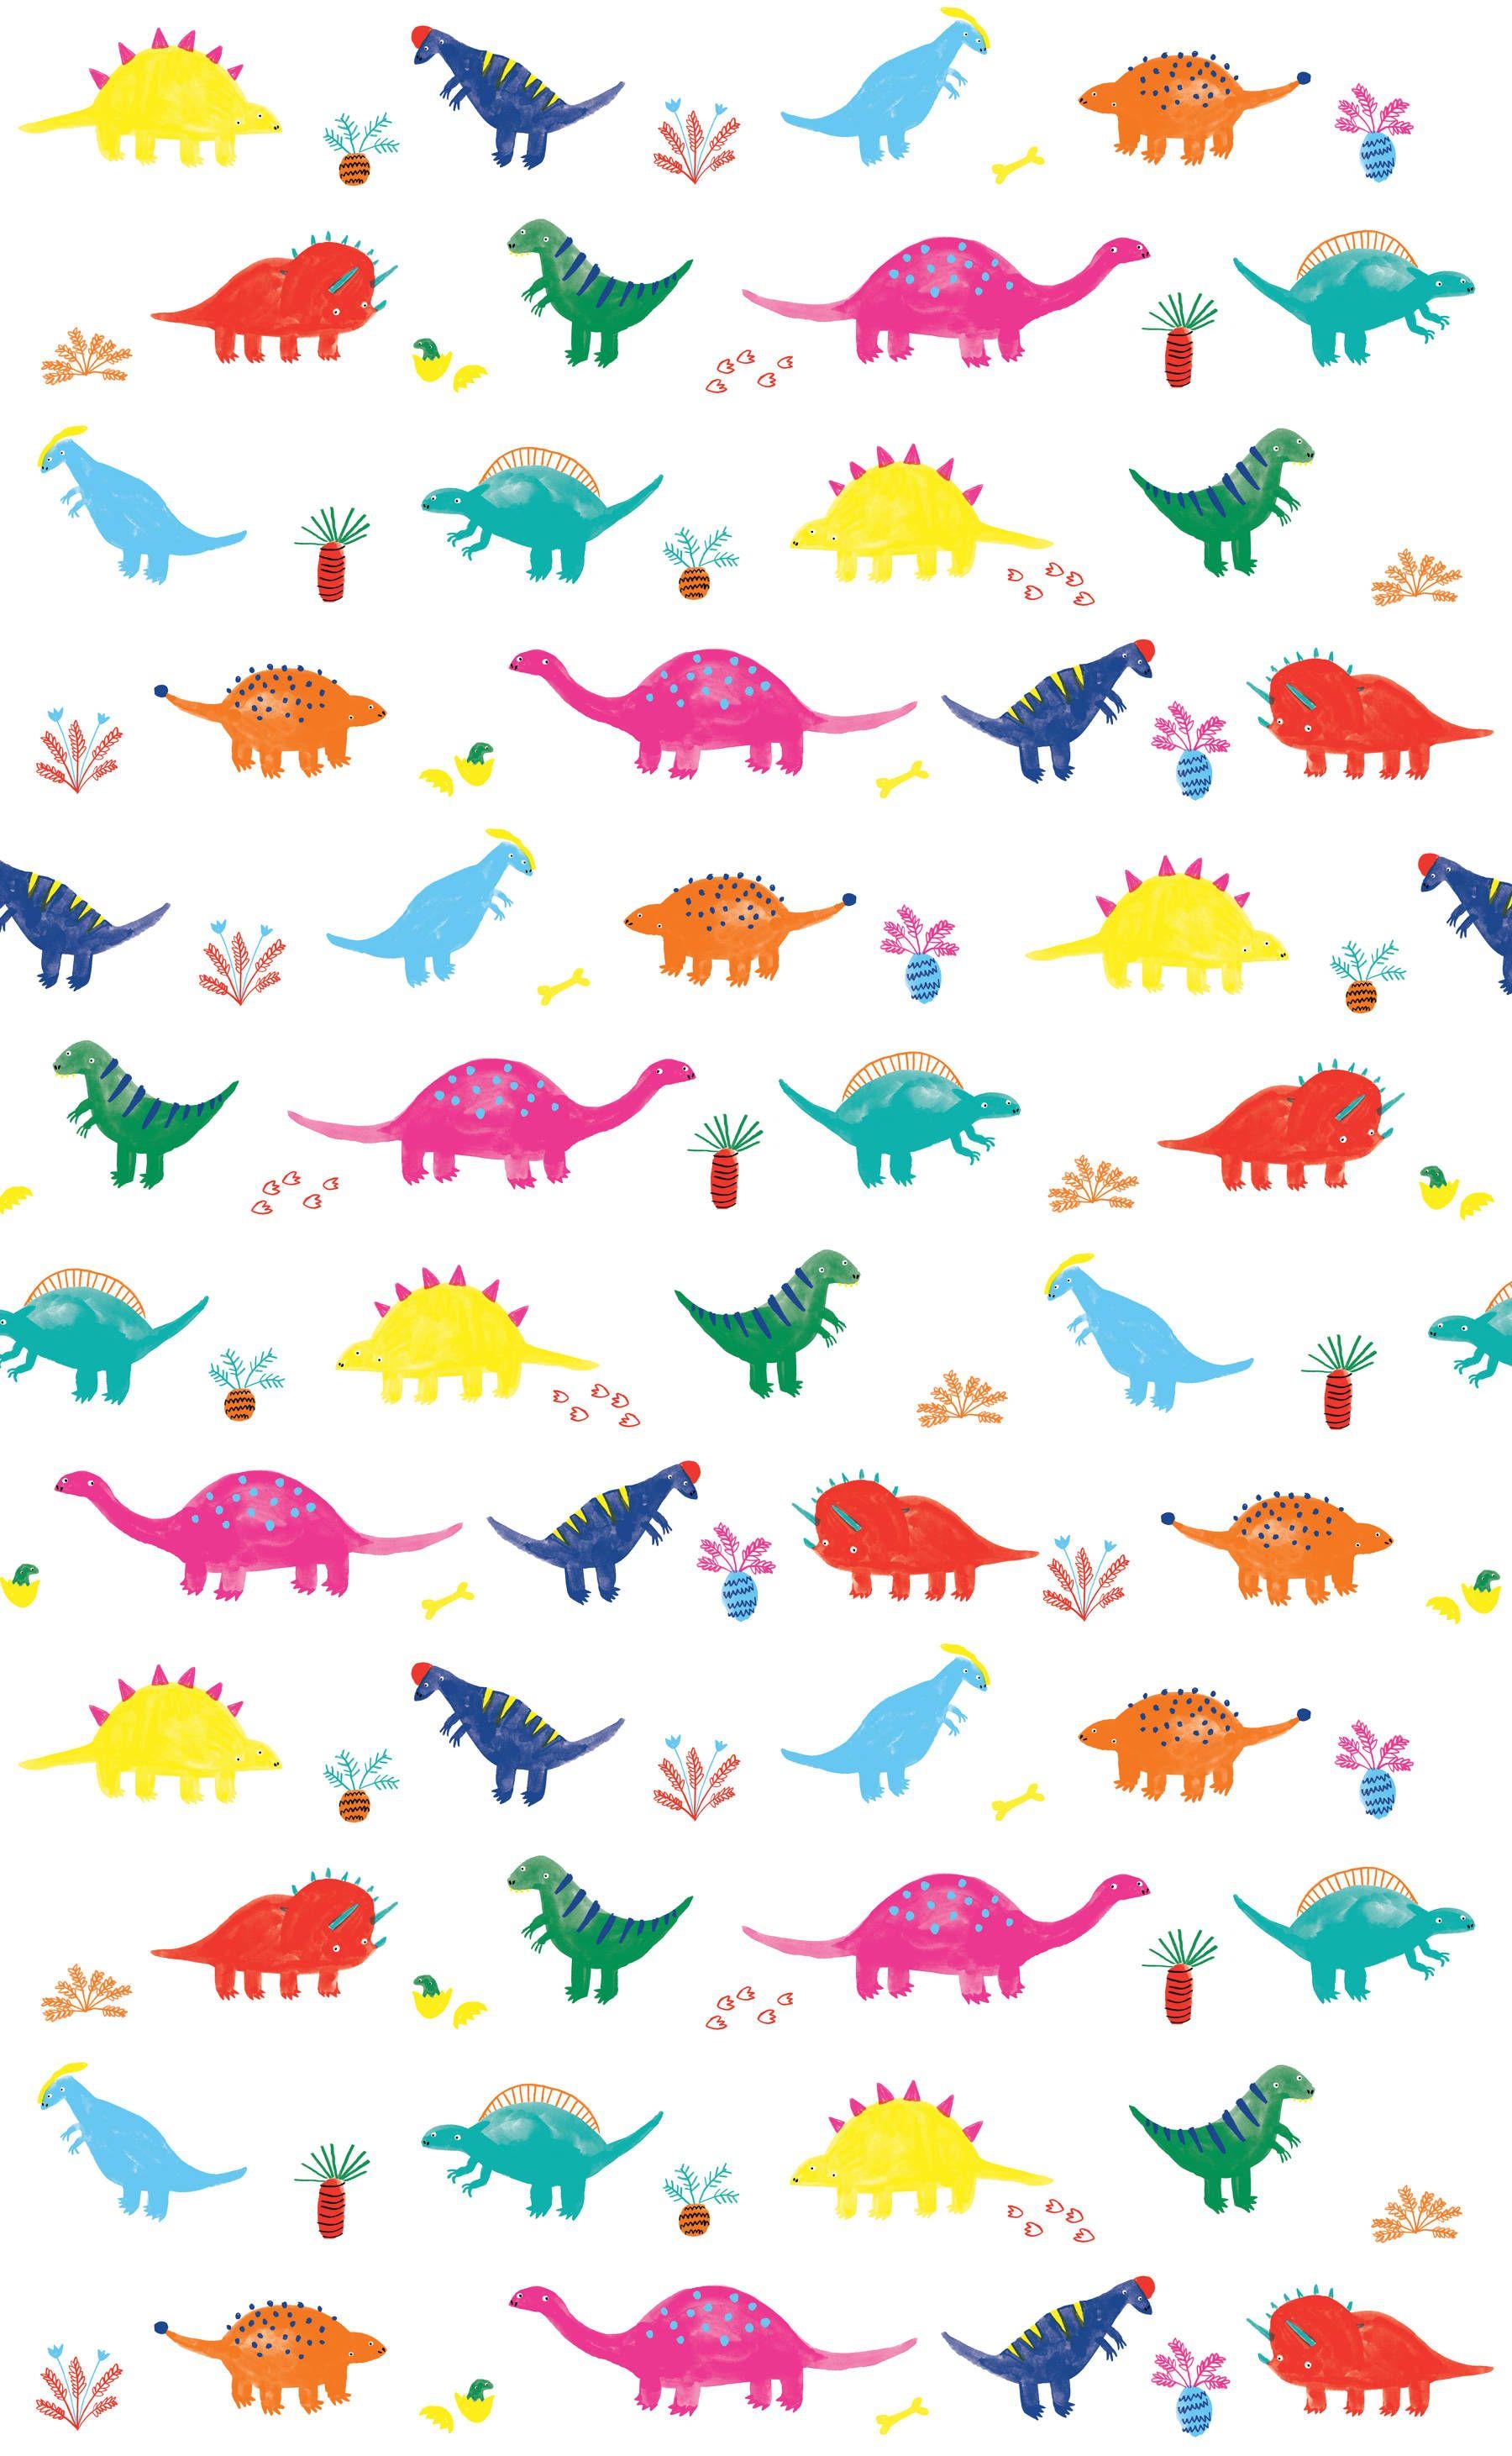 NEW! Dinosaur pattern Lorna Scobie Illustration (With